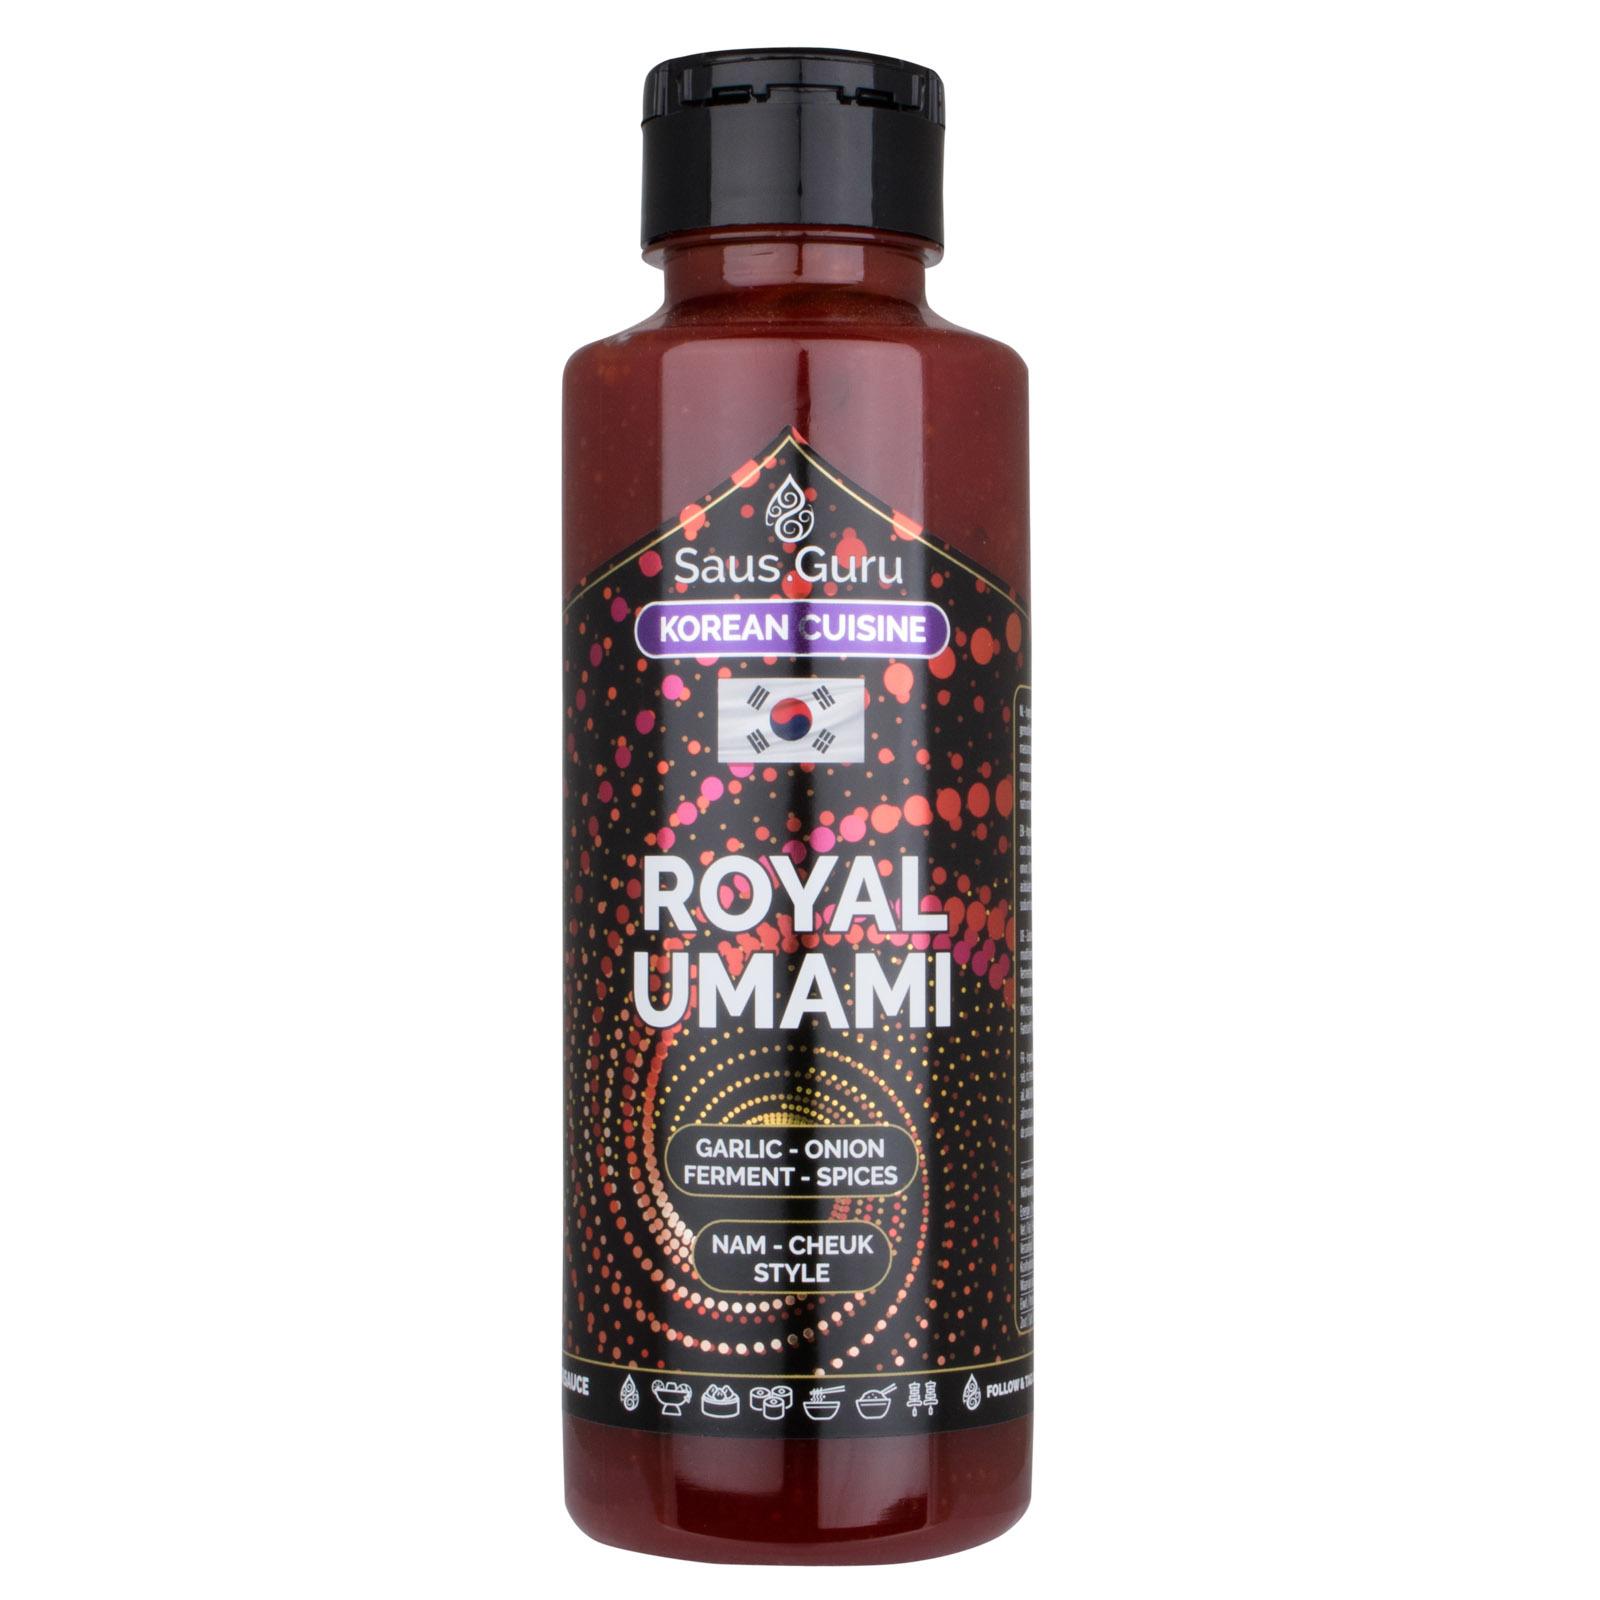 Saus.Guru's Royal Umami-2